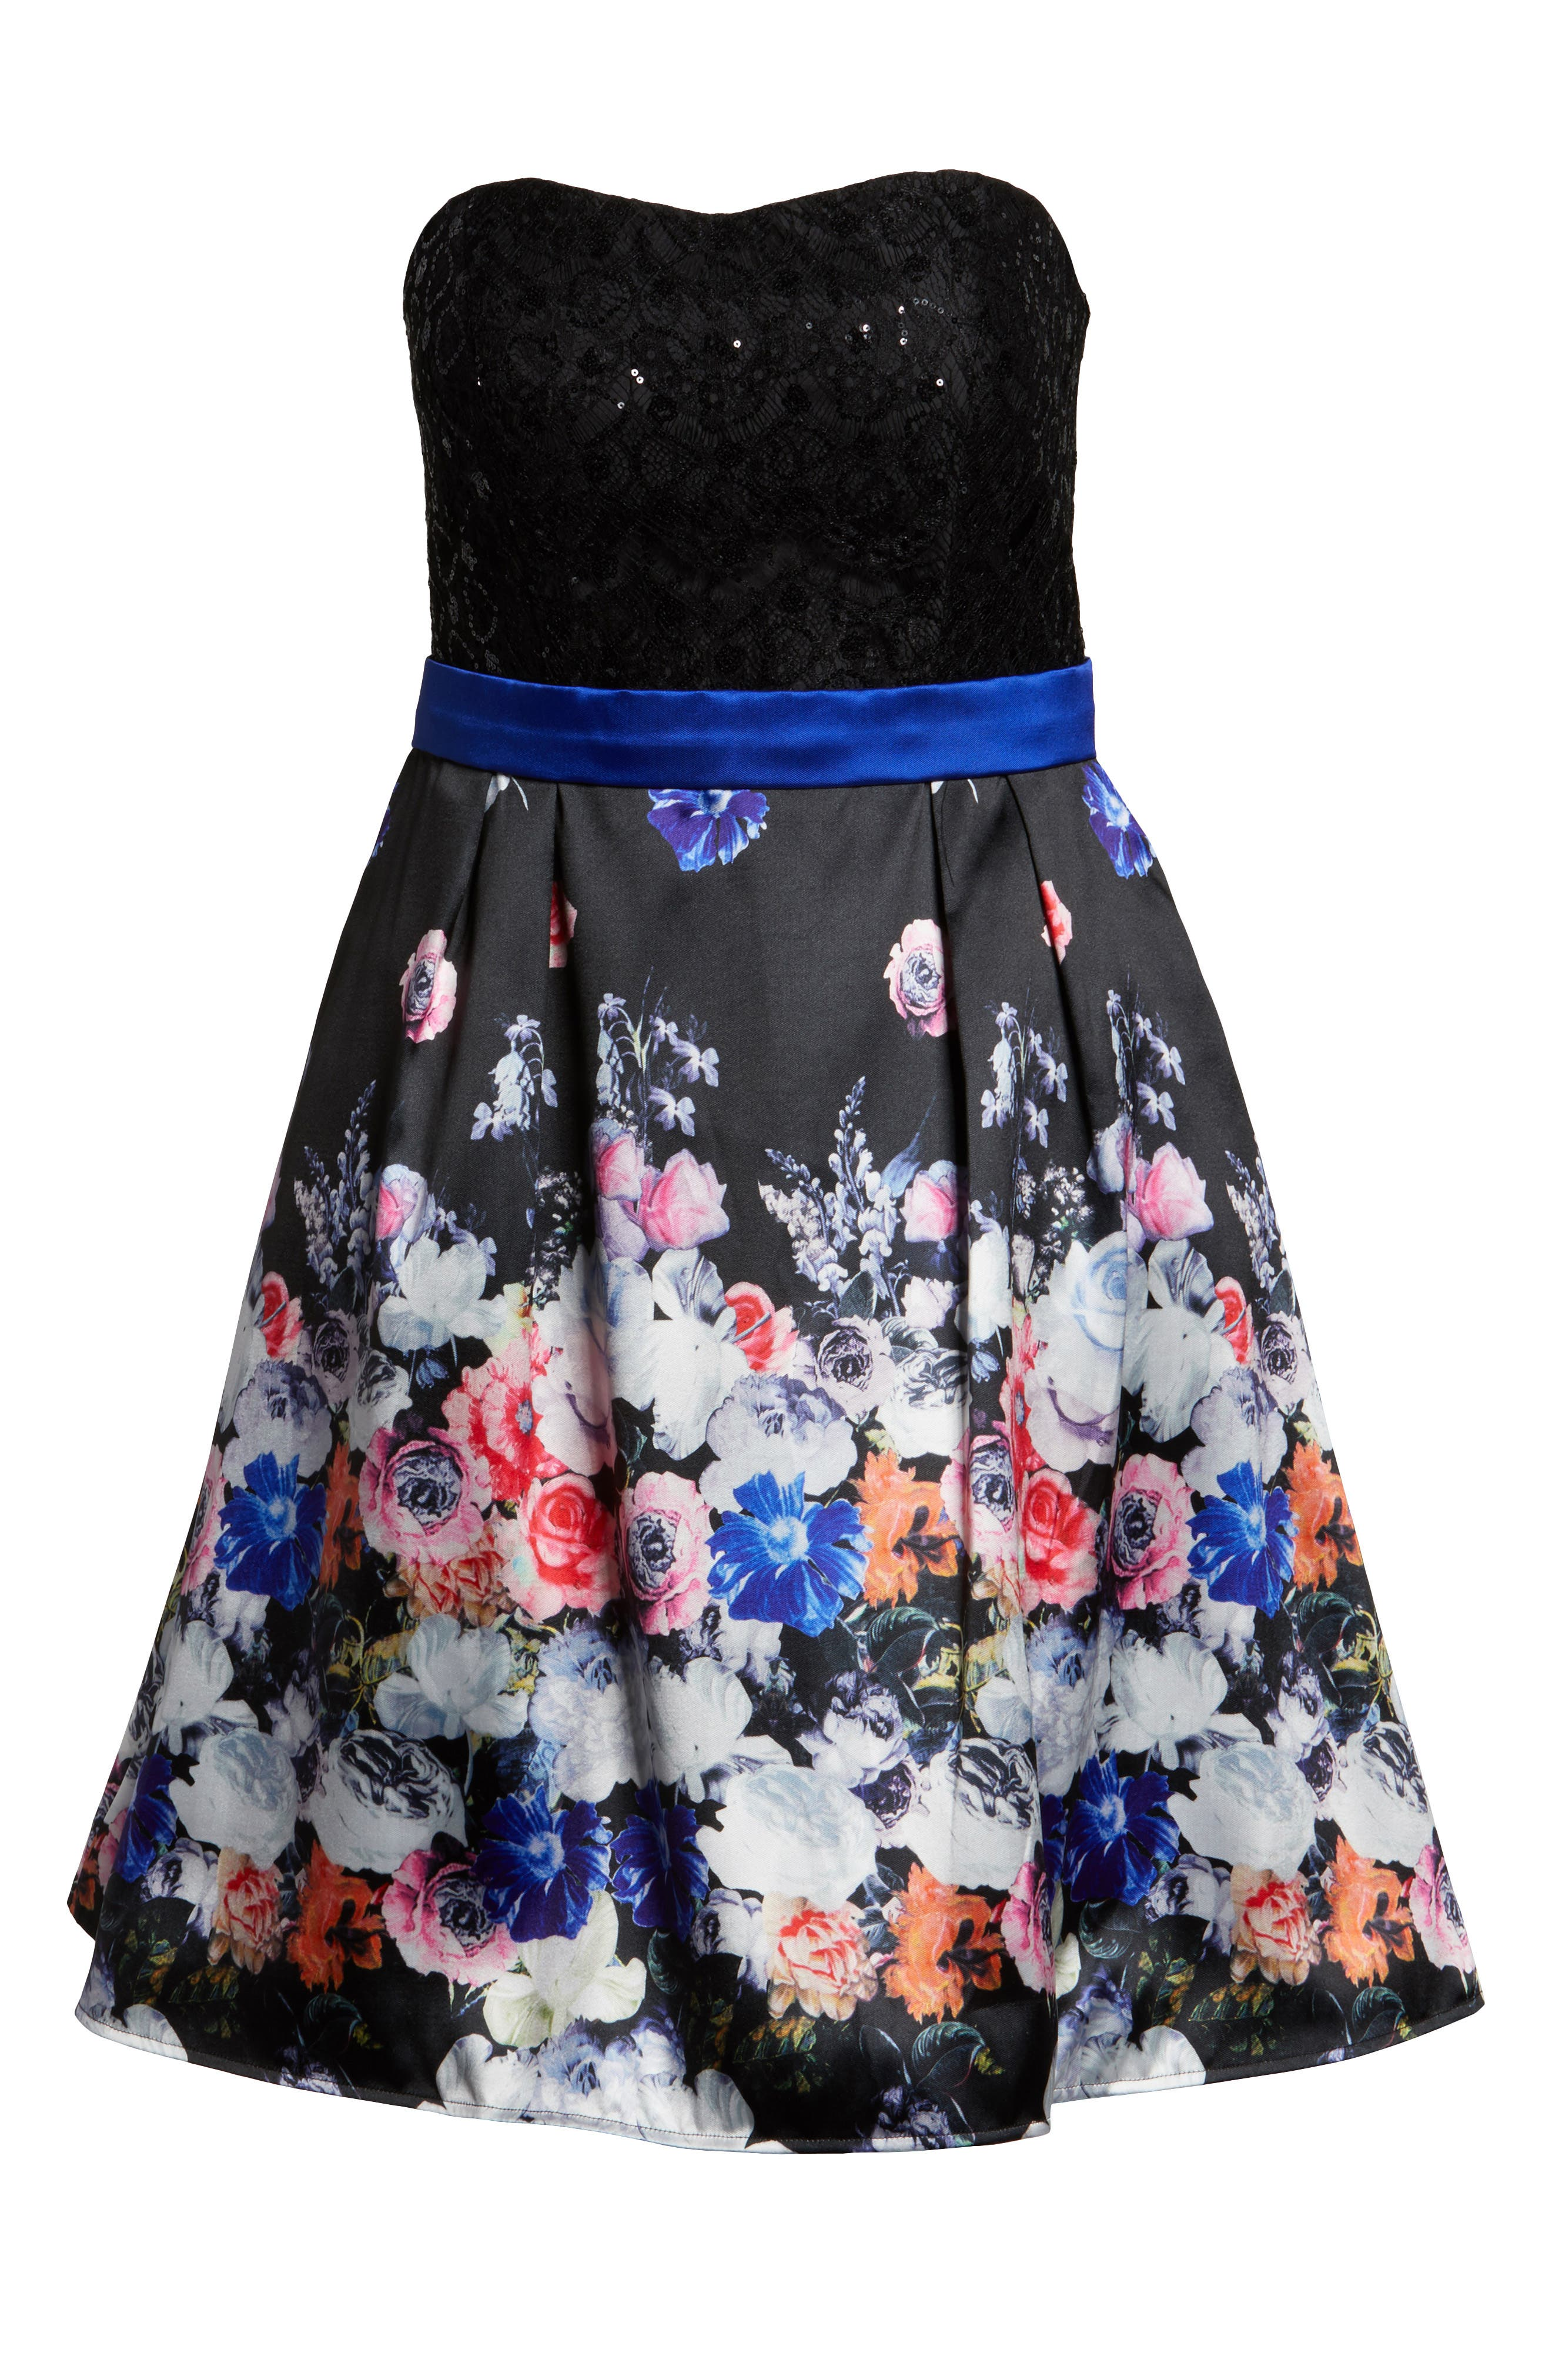 Floral Print Strapless Fit & Flare Dress,                             Alternate thumbnail 6, color,                             Black/ Multi